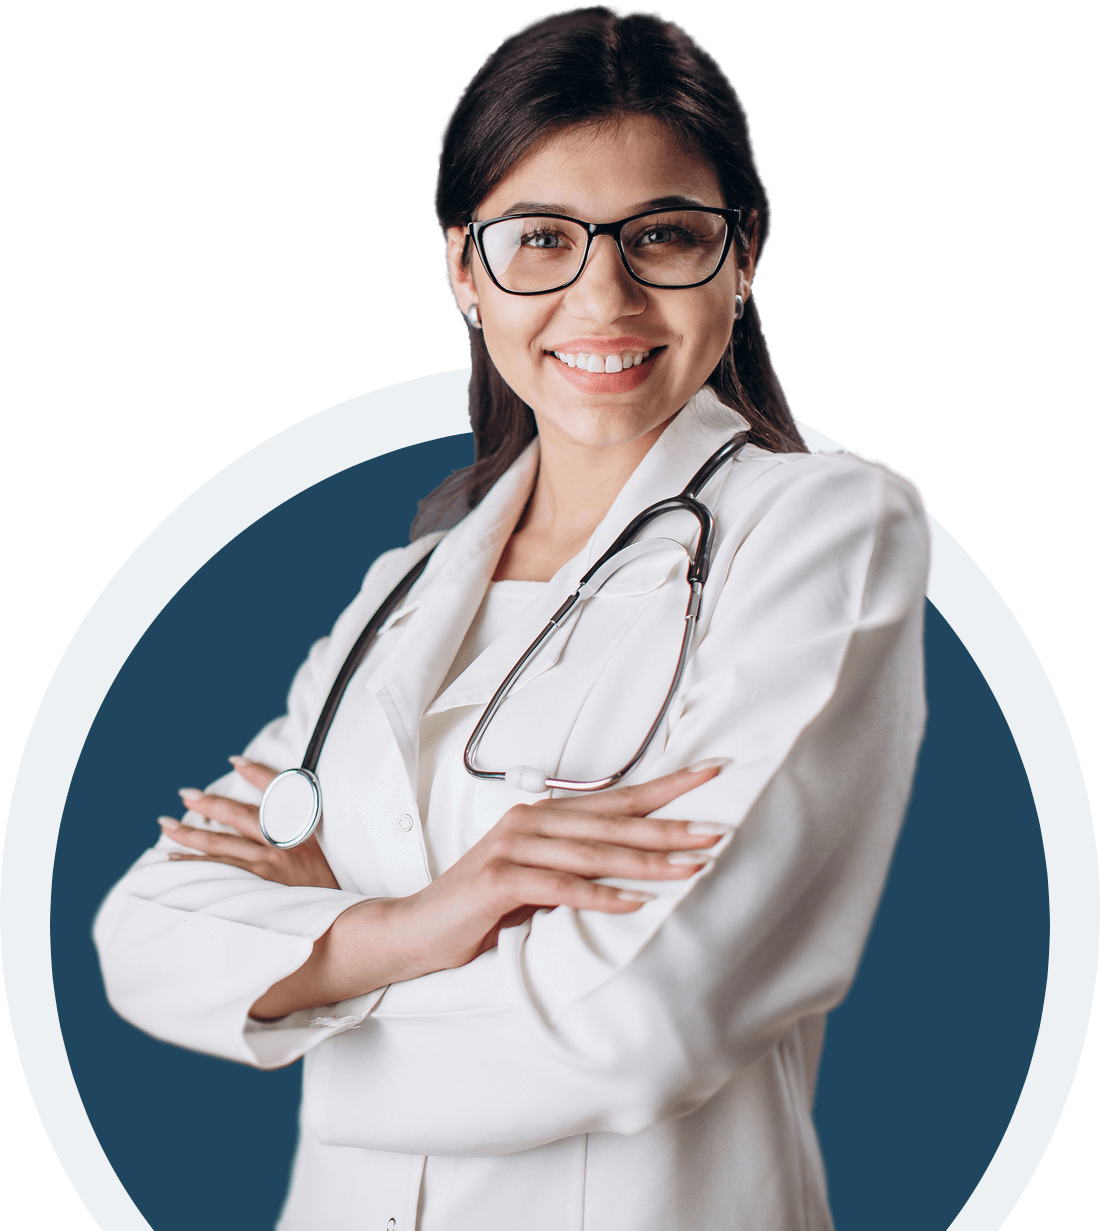 Medical Careers Background